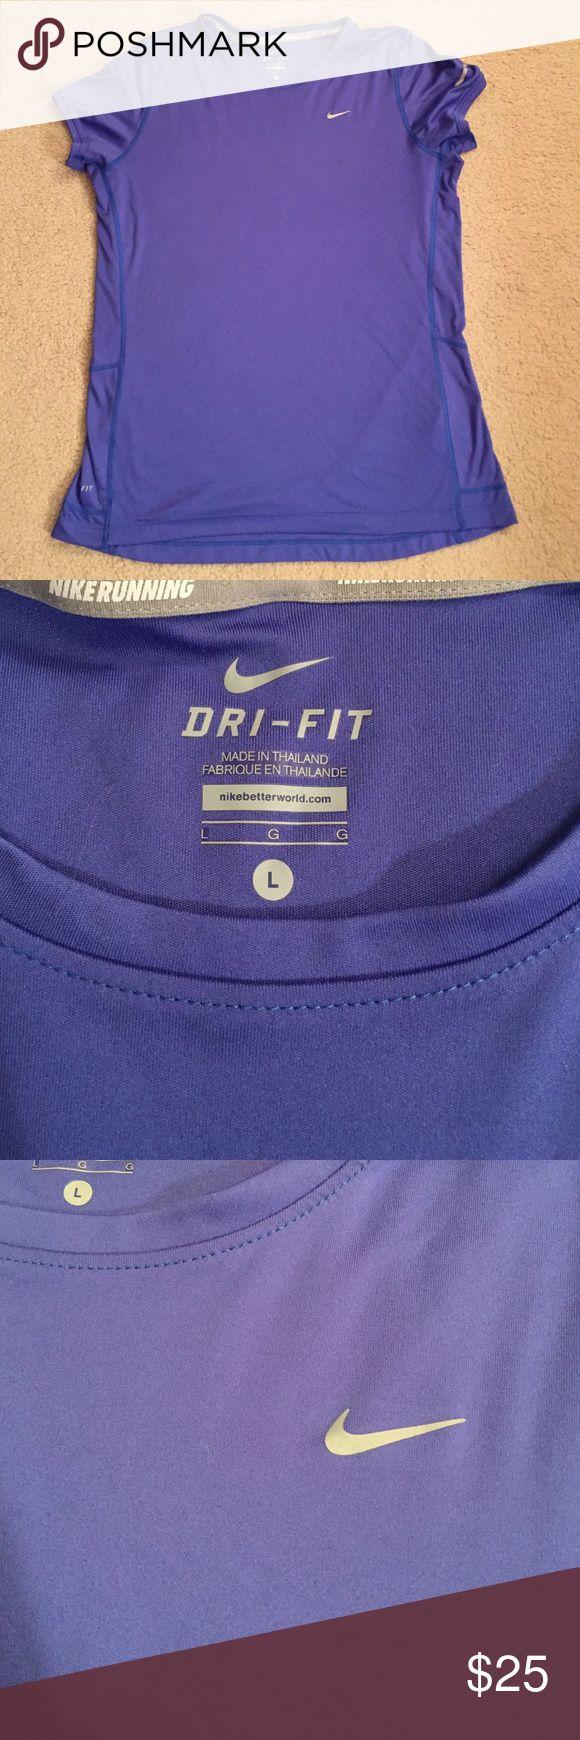 Nike Dri-fit T-shirt Royal blue Nike Dri-fit shirt sleeve t-shirt in perfect condition! Nike Tops Tees - Short Sleeve